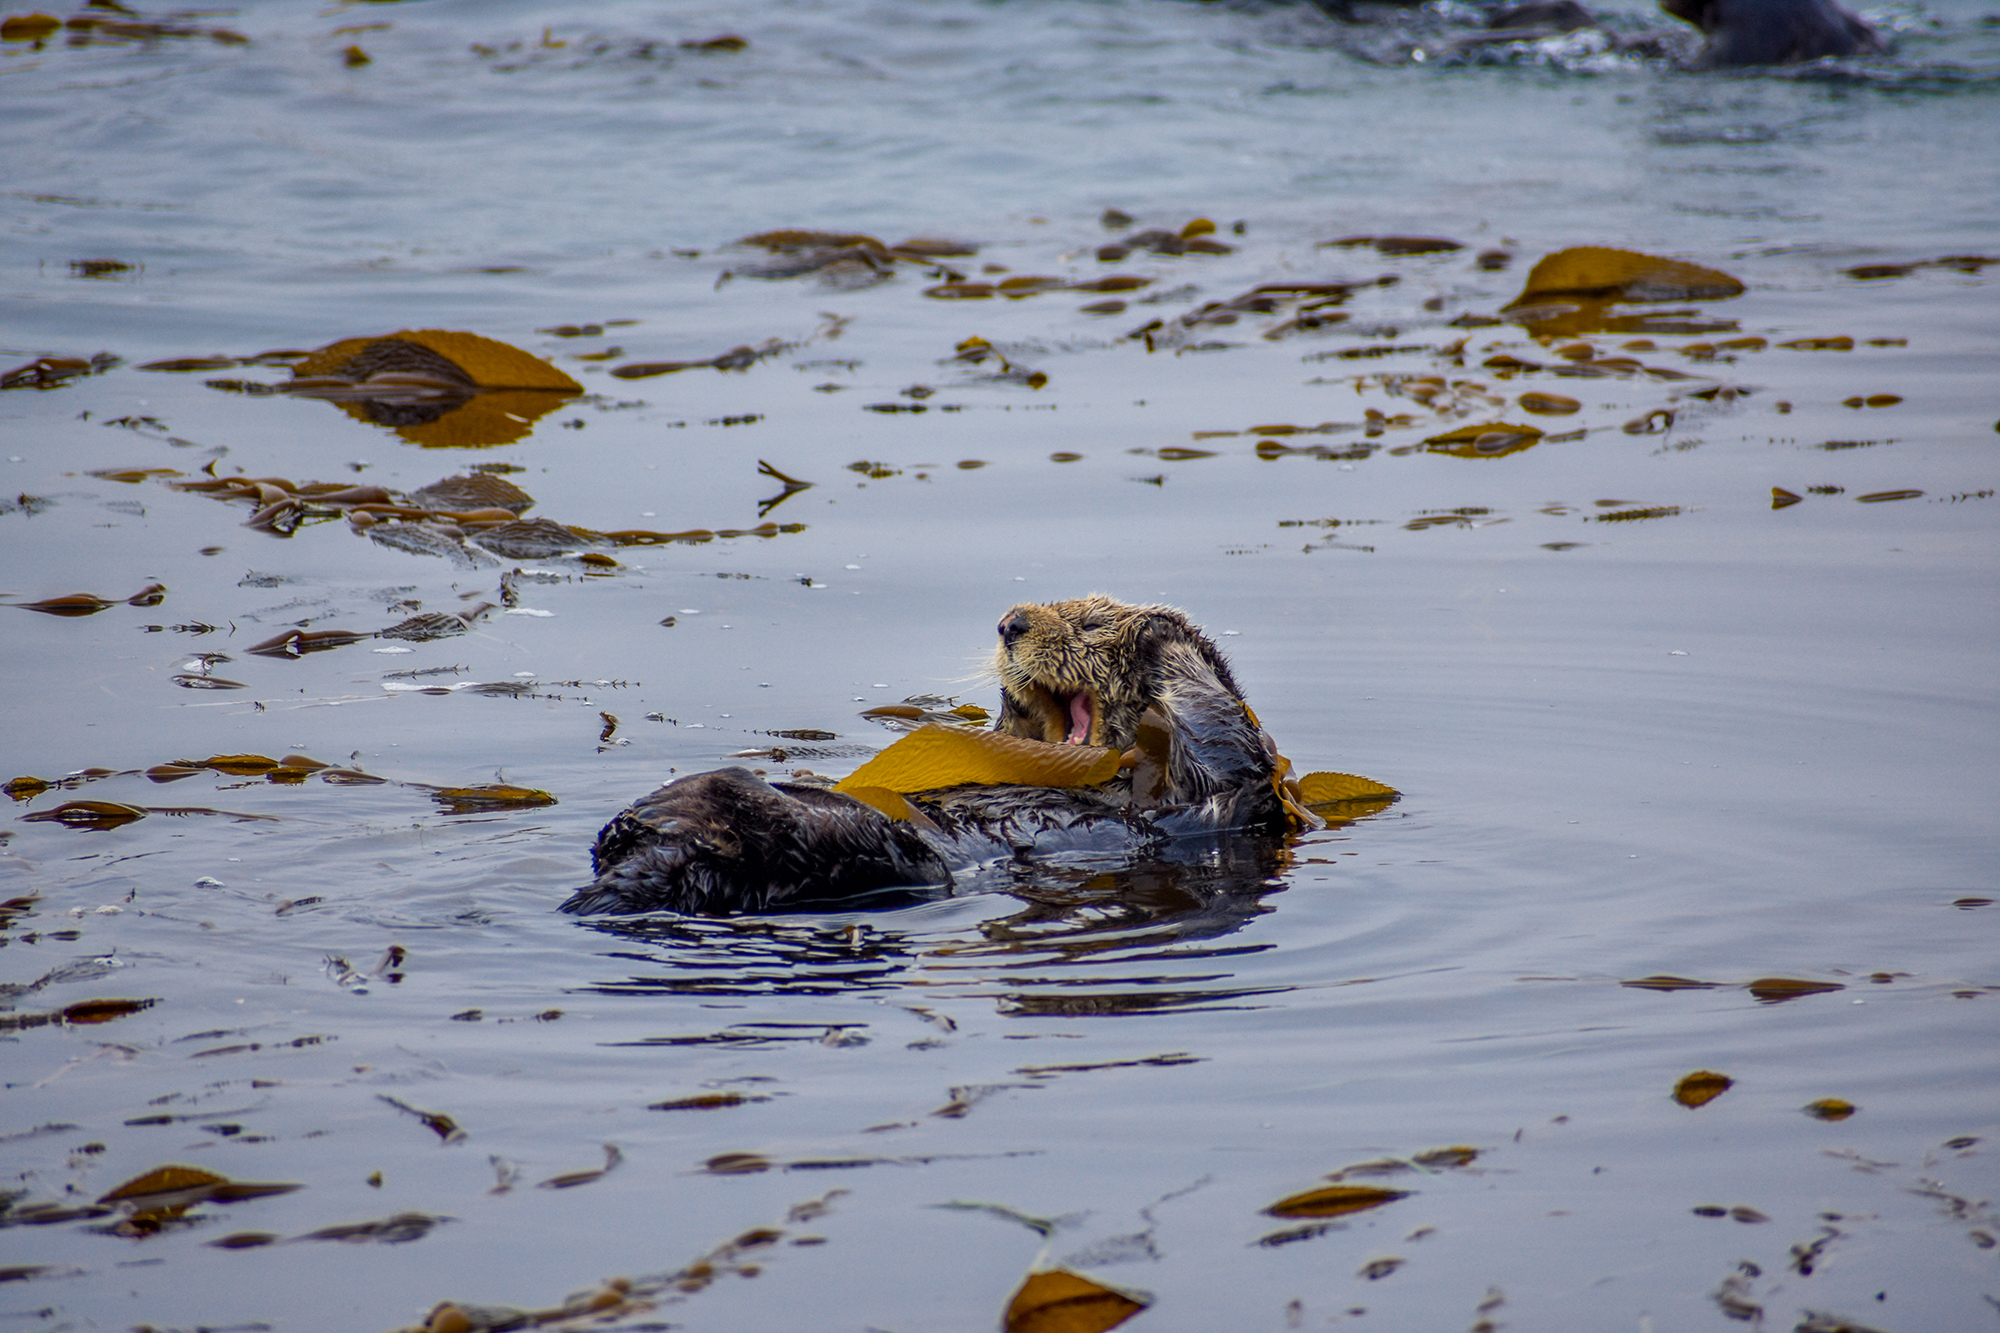 Sea otter waking up in Morro Bay.